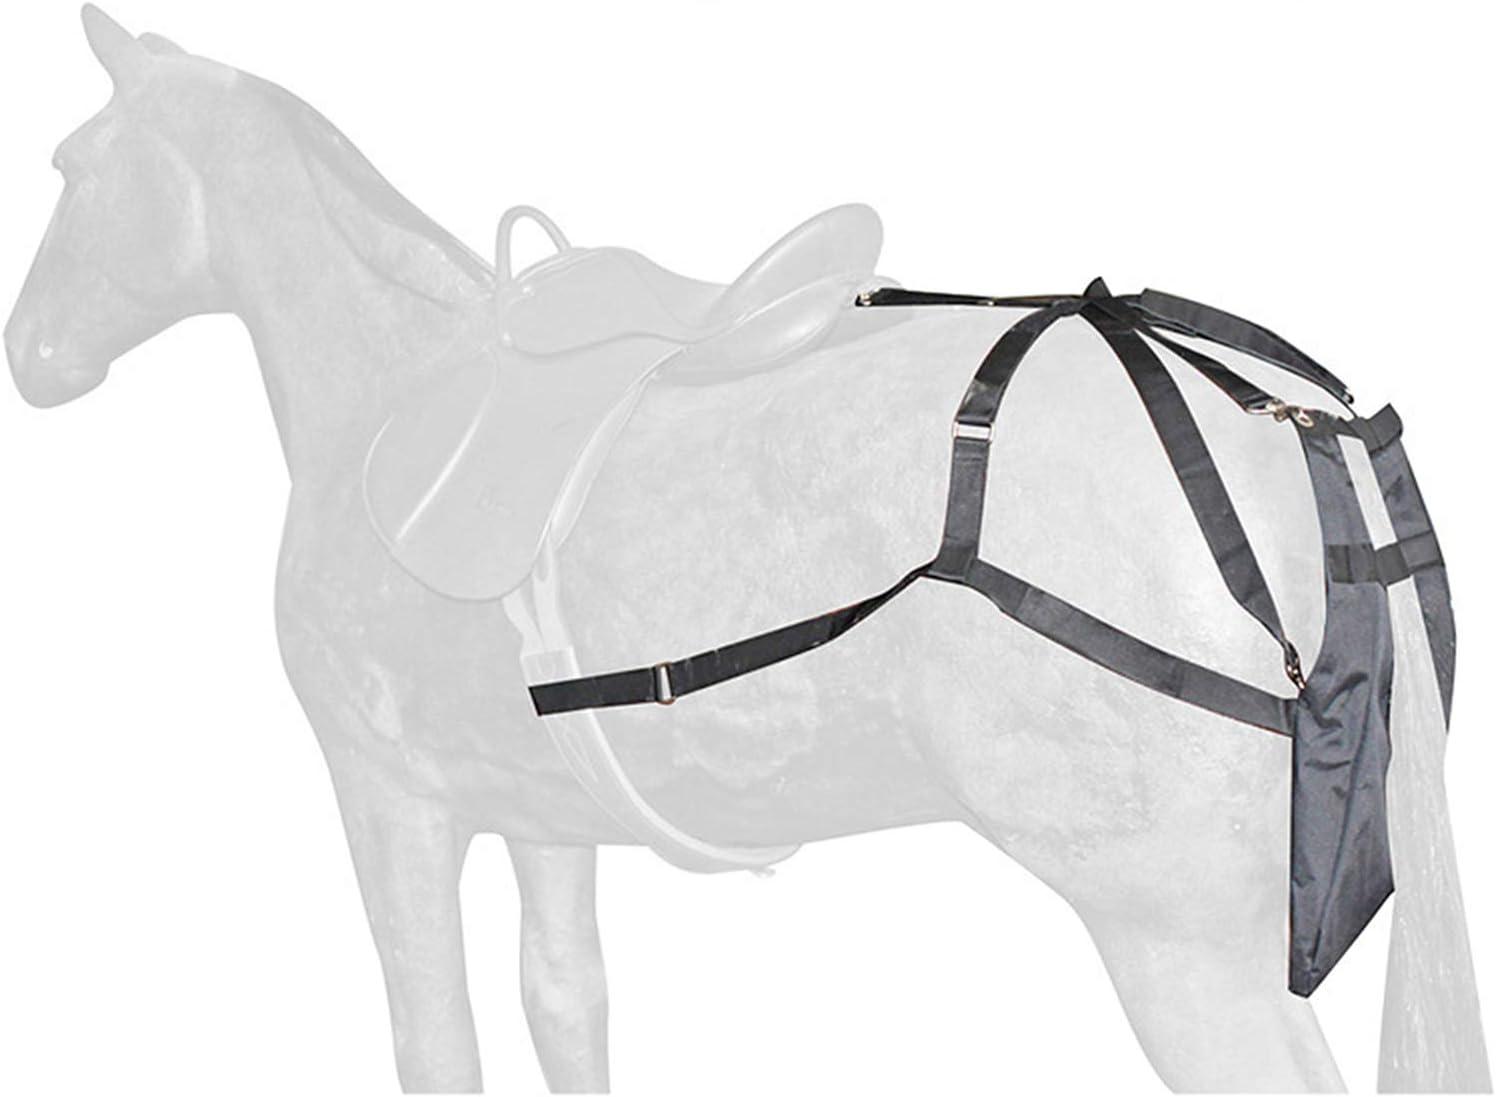 Missstore Equine Urine and Manure Bag